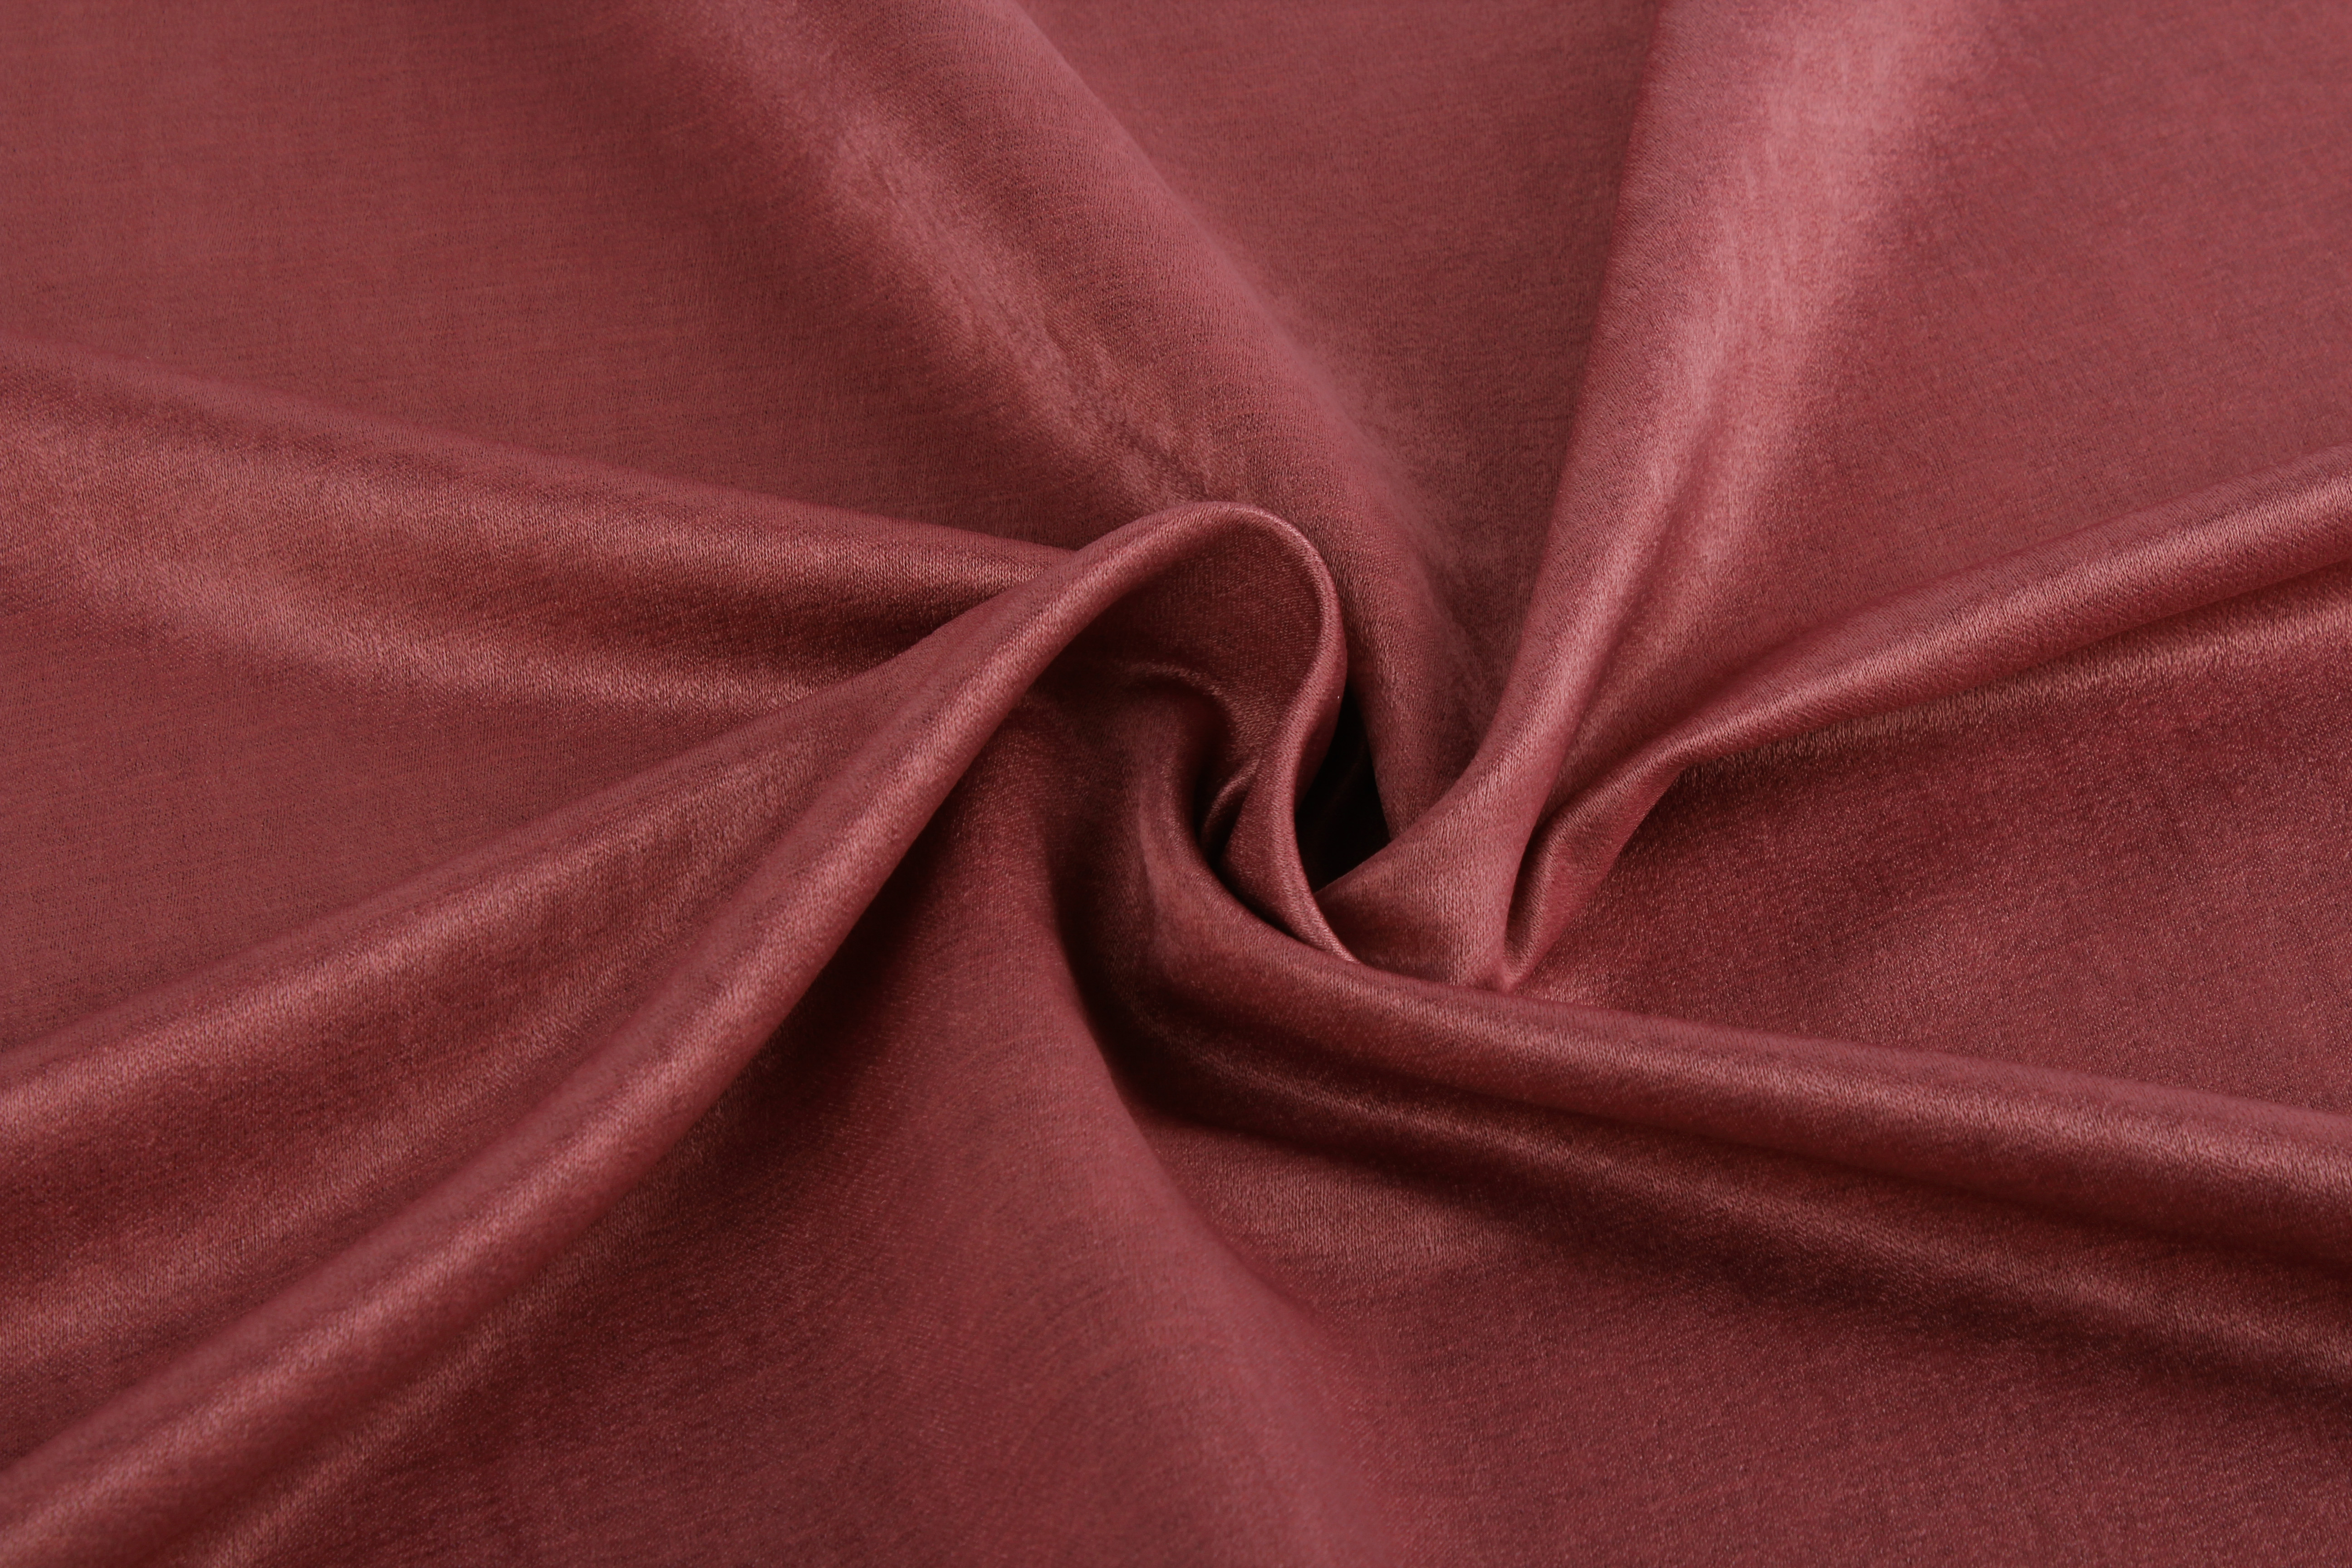 {} TexRepublic Материал Портьерная ткань Palette Цвет: Брусничный texrepublic материал портьерная ткань palette цвет брусничный